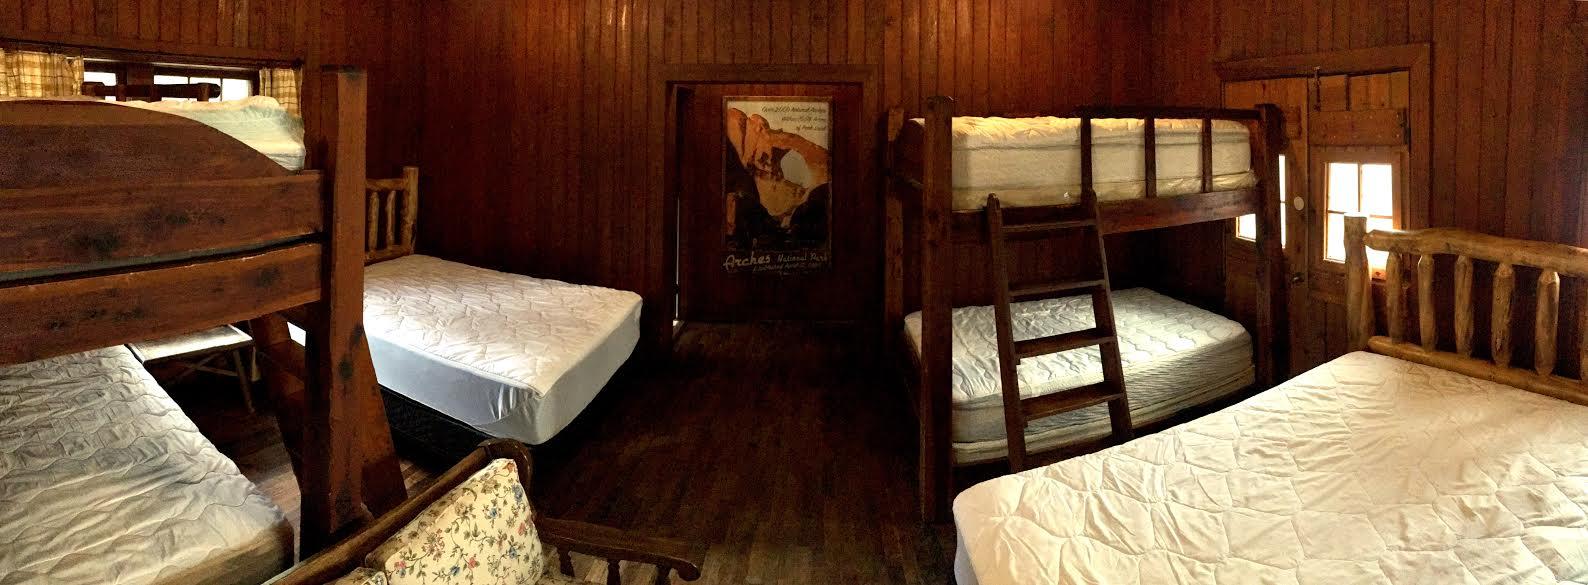 Lodge Bunk Room